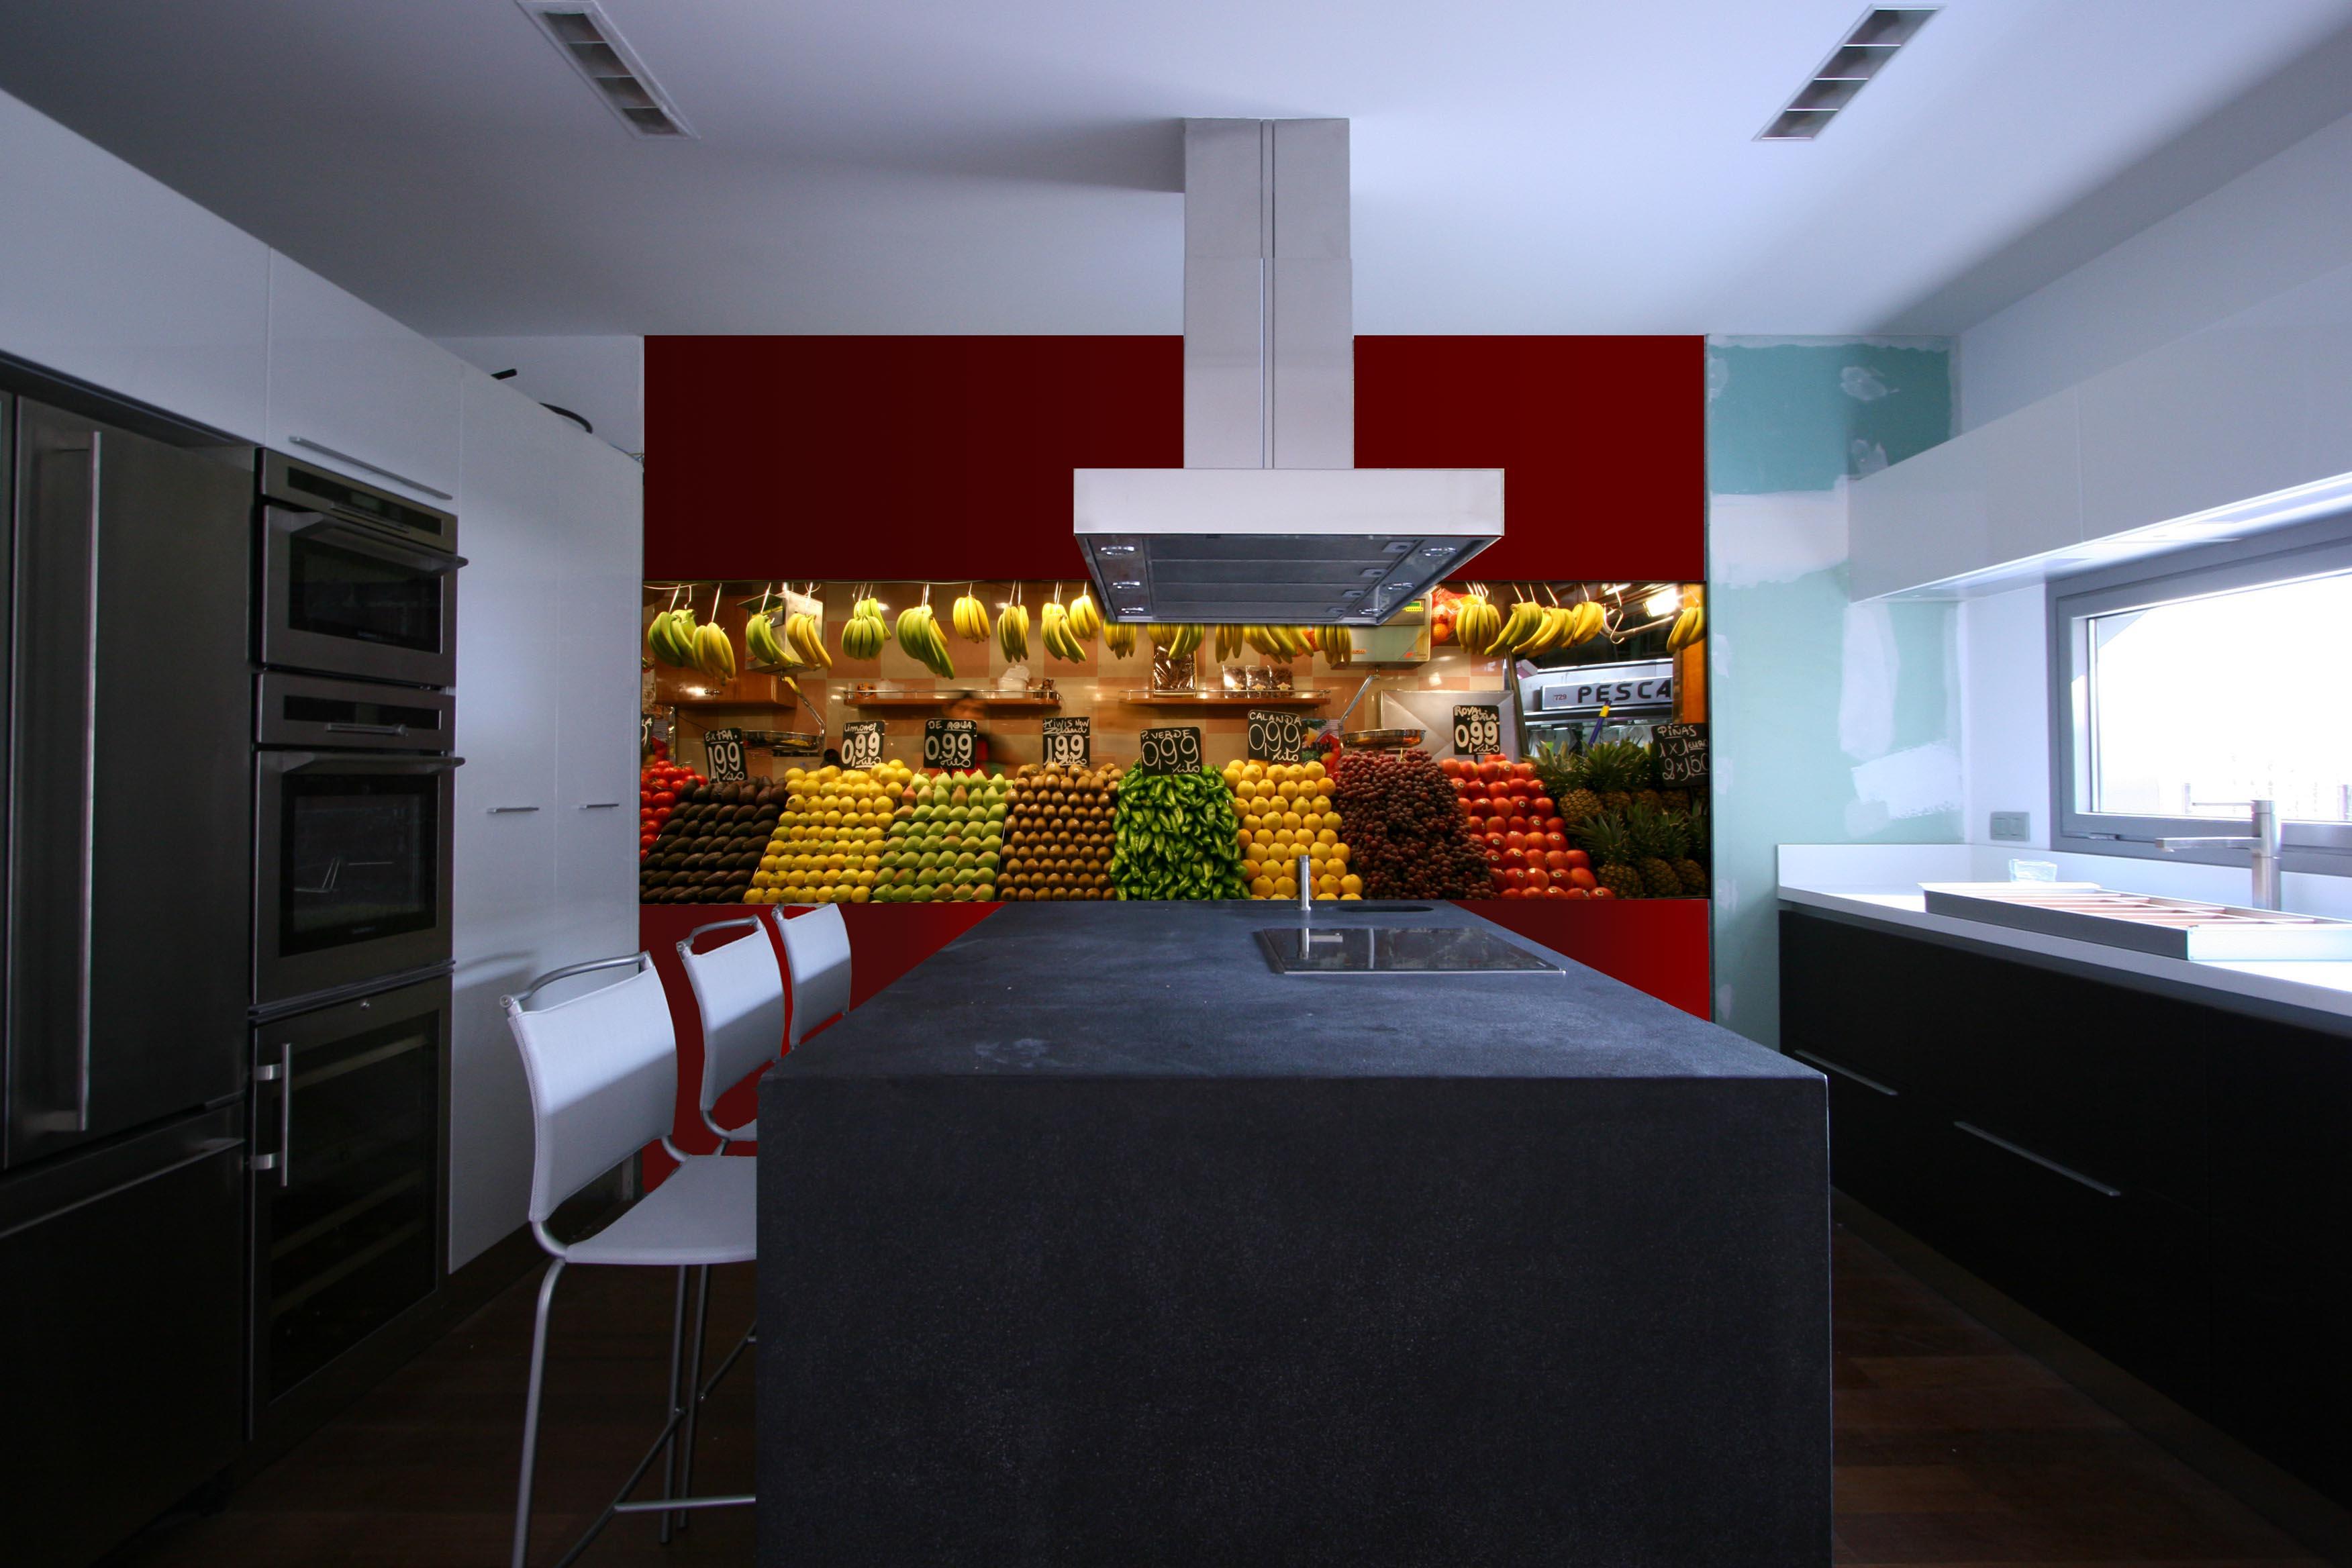 rosa jimenez   antalis interior design award